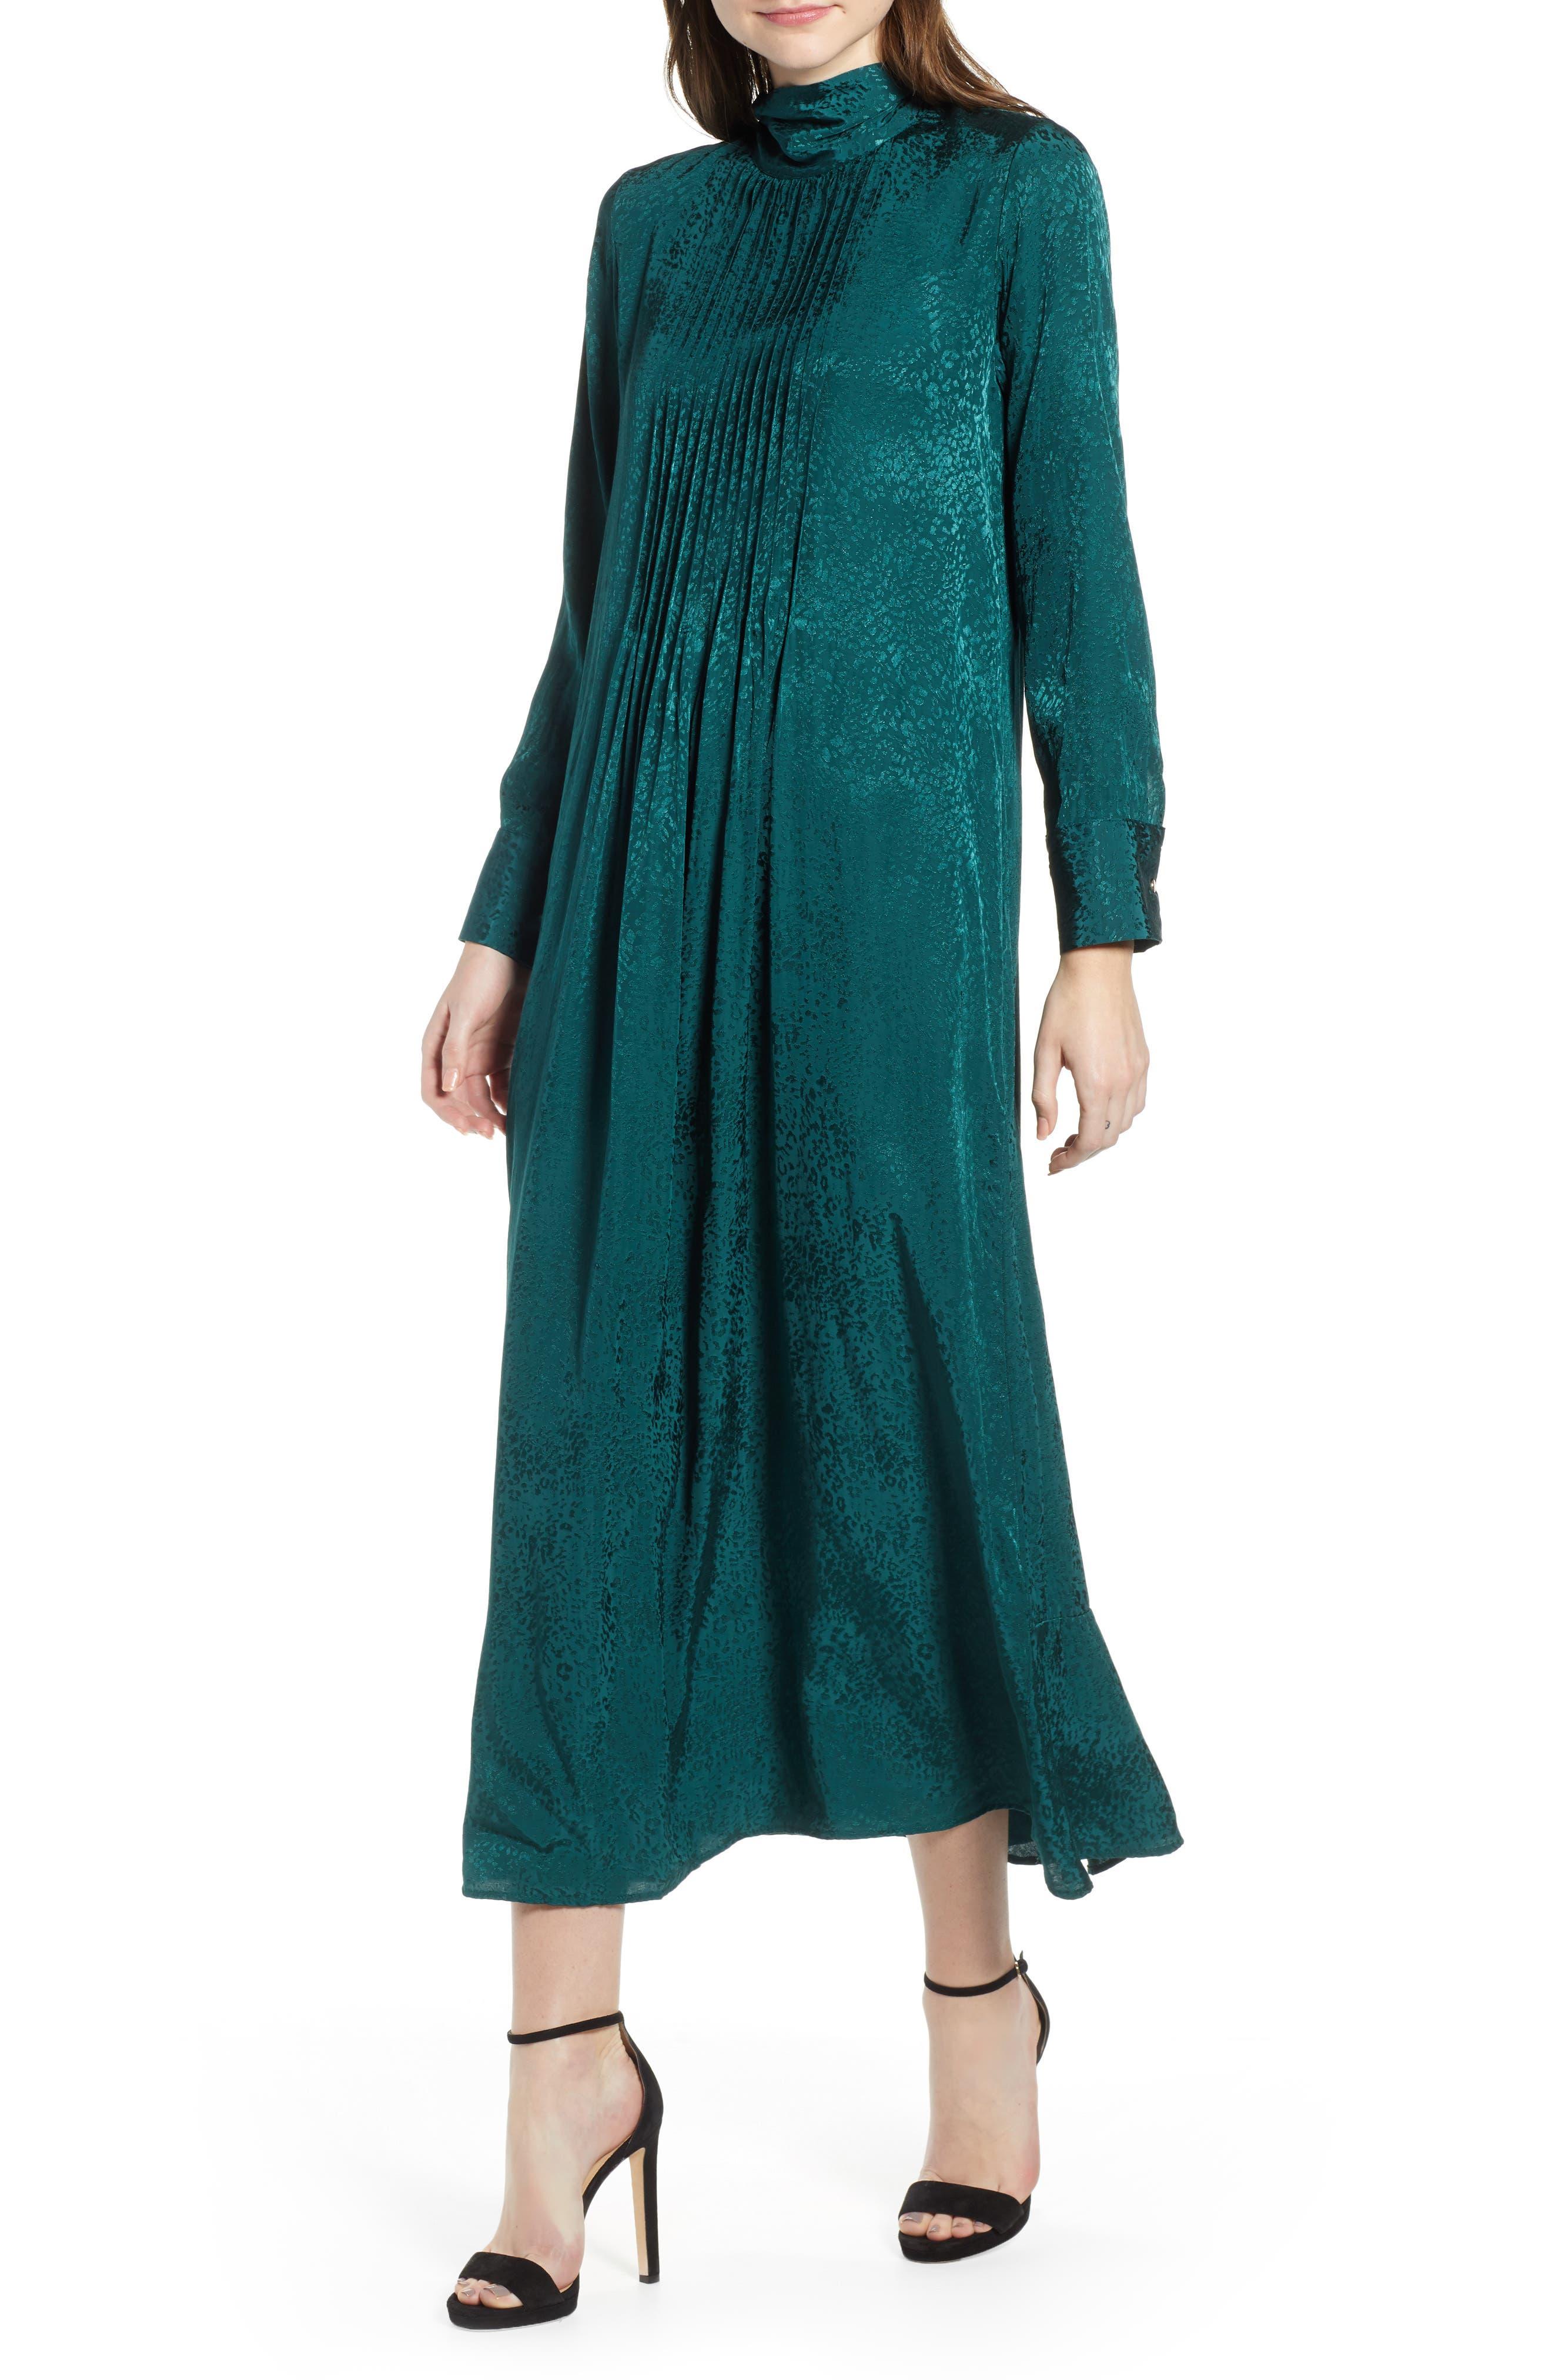 Topshop Jacquard Pintuck Satin Midi Dress, US (fits like 10-12) - Green